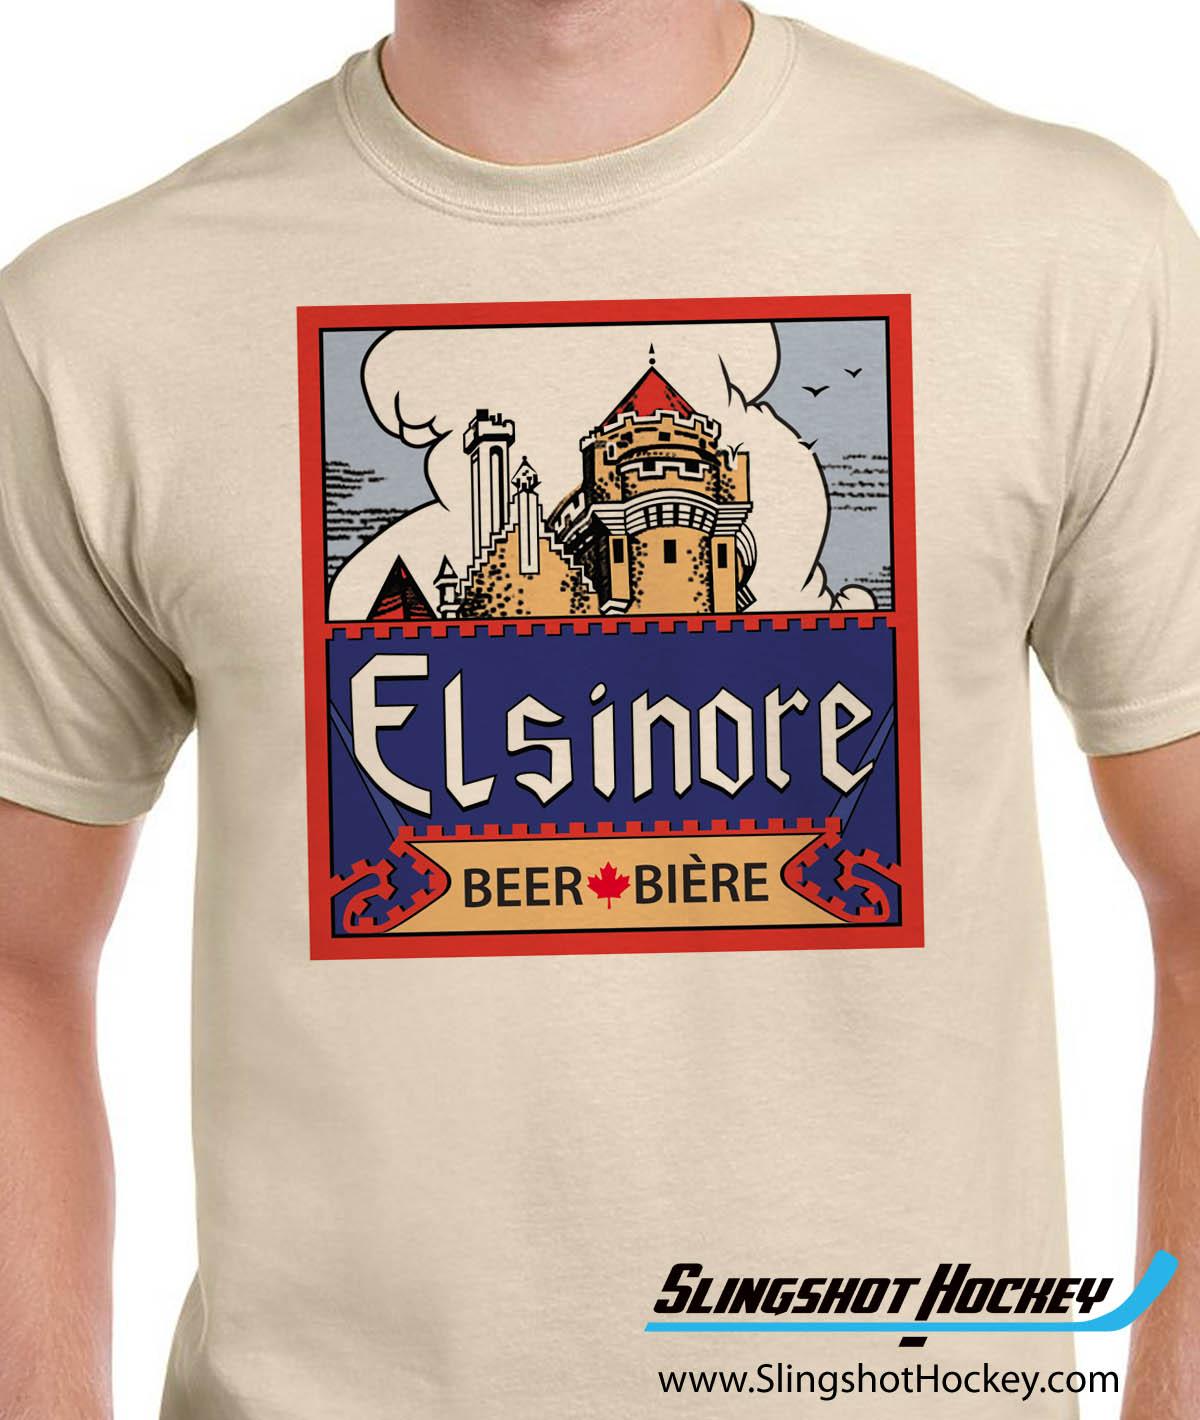 8661e36d1313 Elsinore Beer Shirt Sale! - Slingshot Hockey